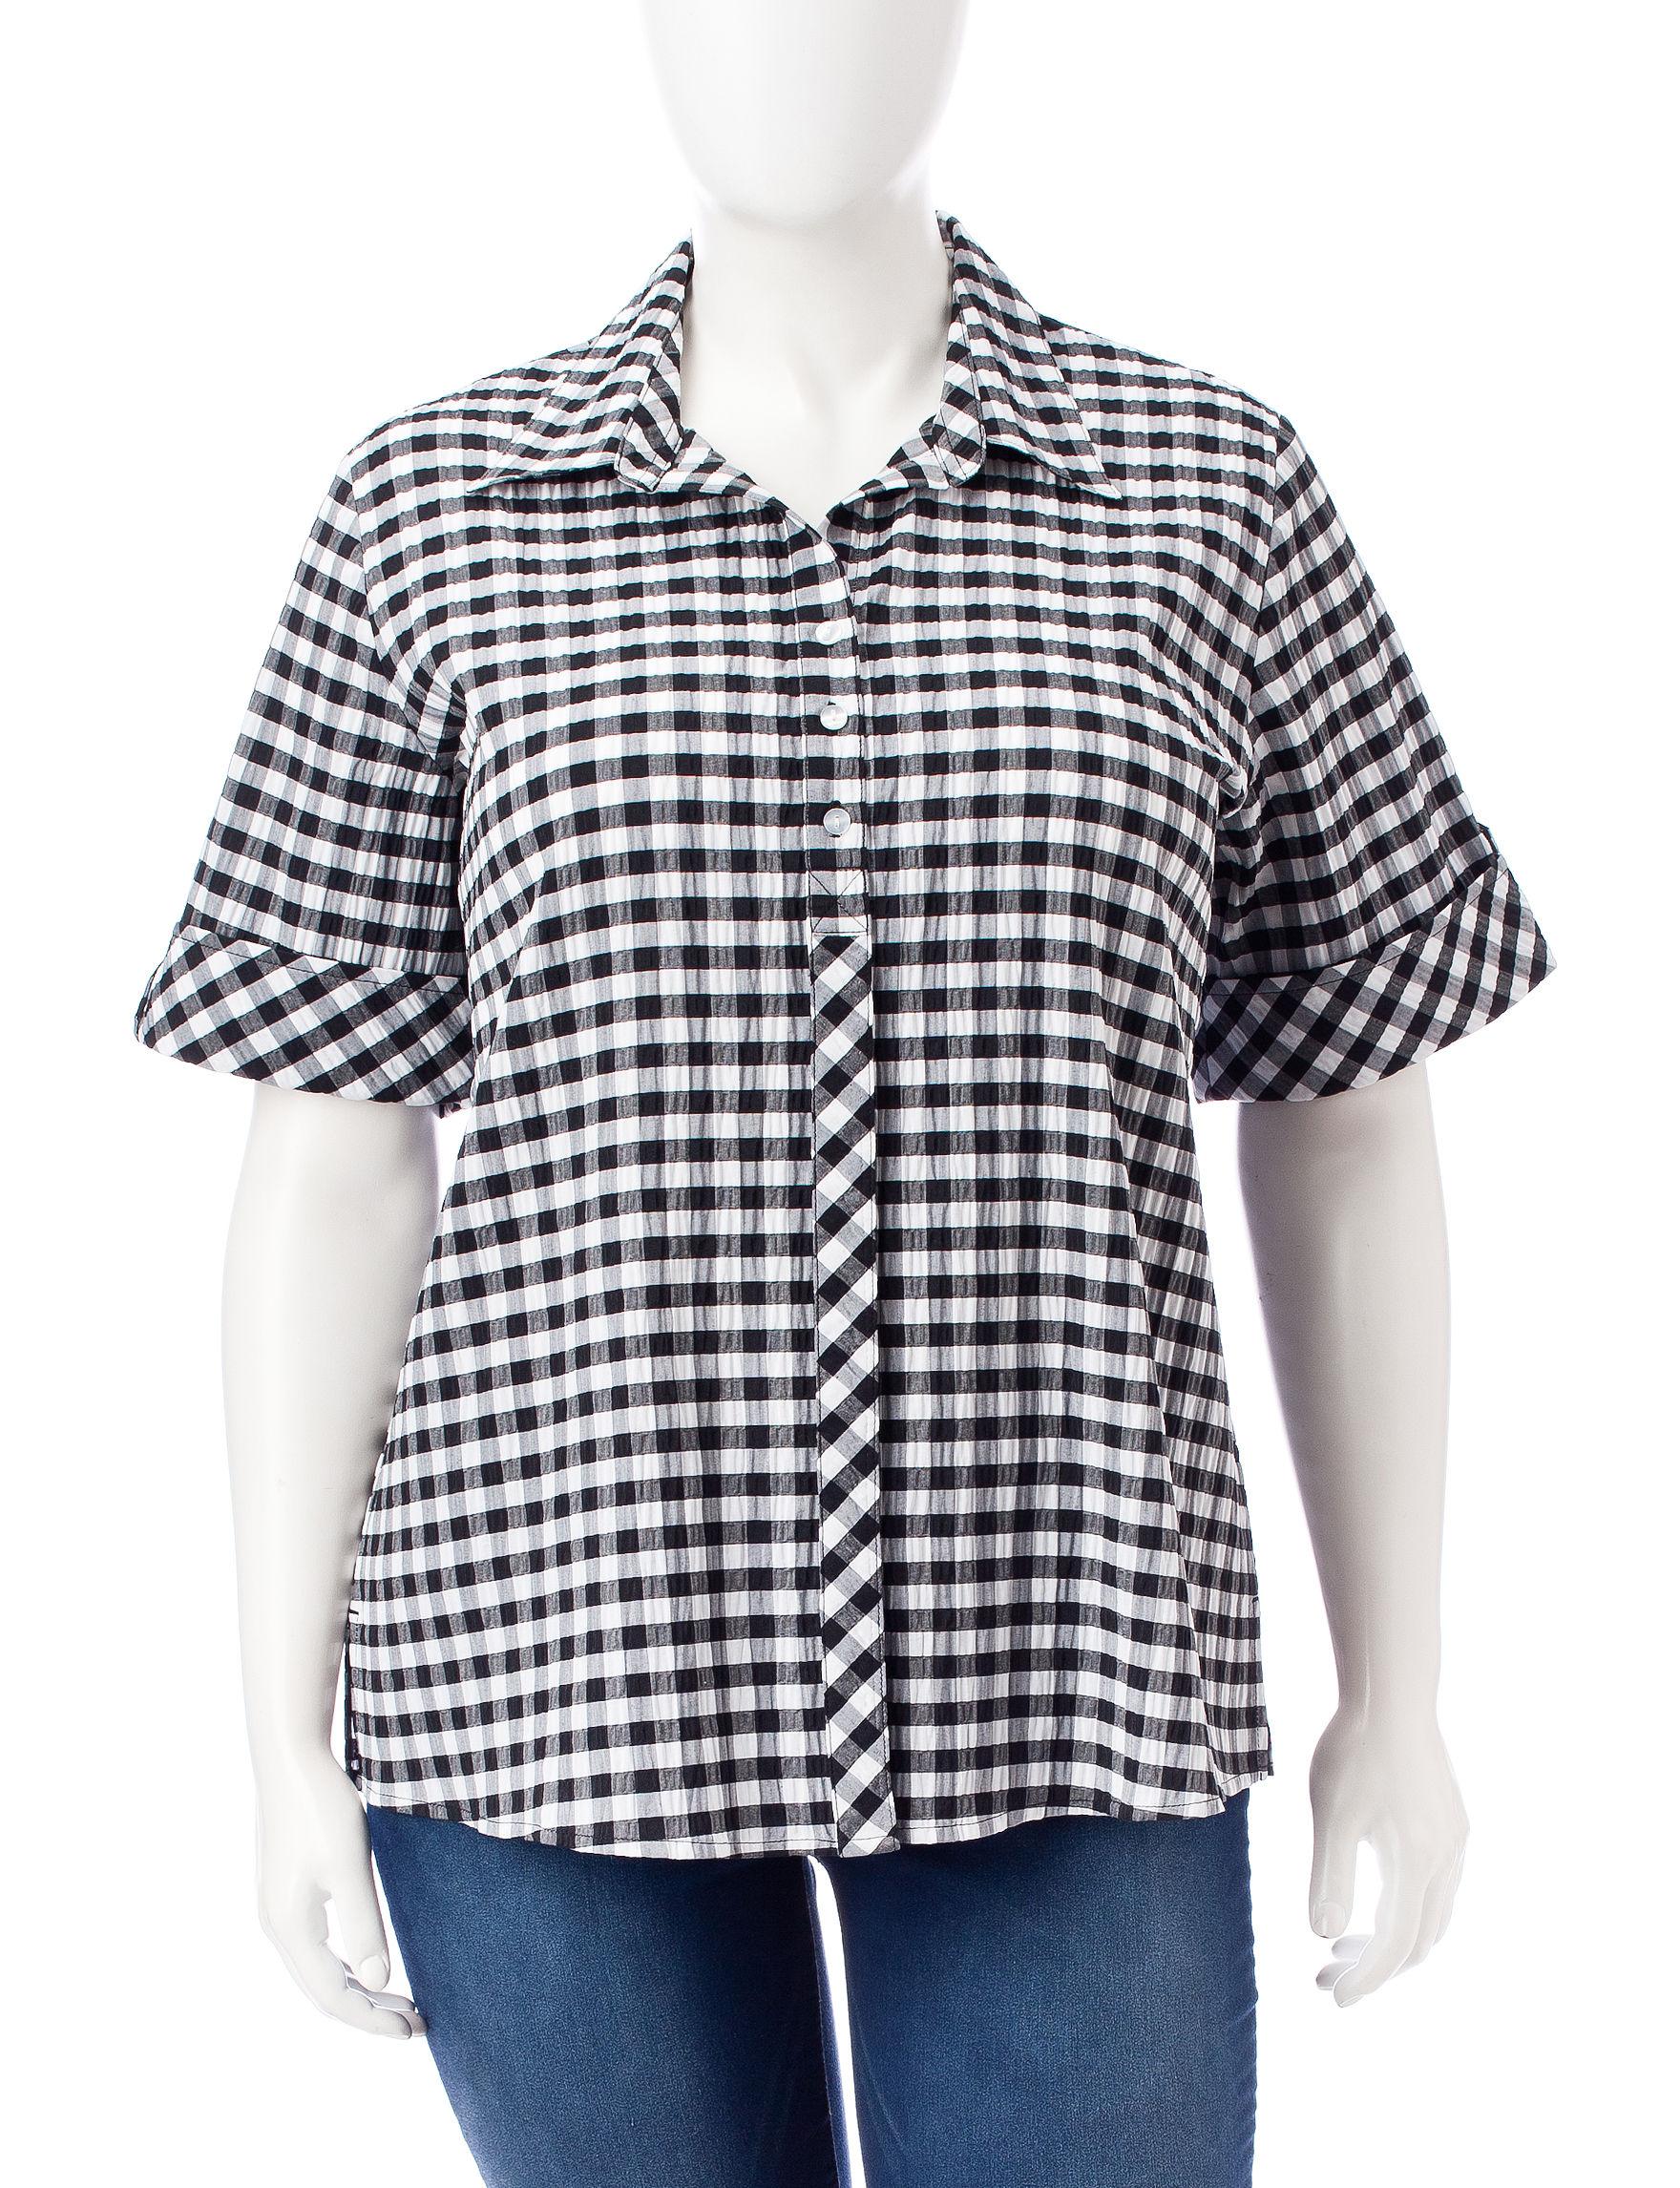 Rebecca Malone Black/ White Shirts & Blouses